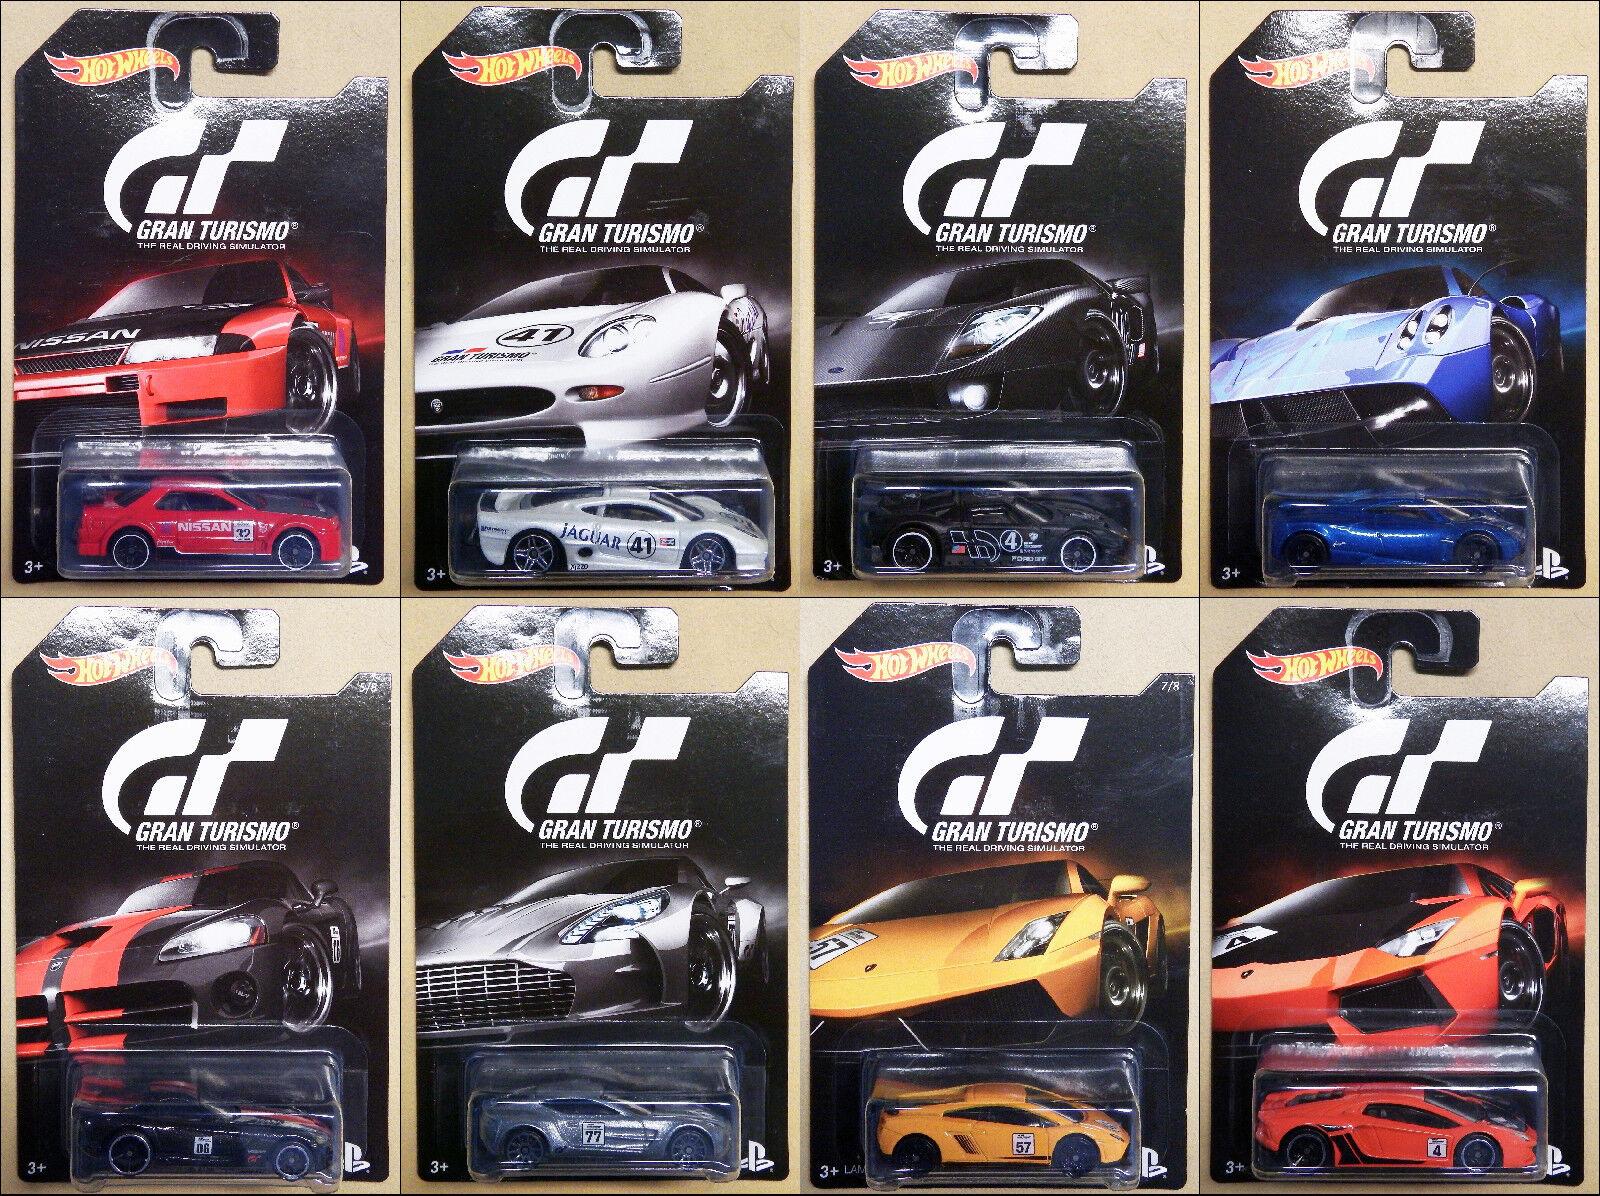 2016 Hot Wheels GRAN TURISMO Set of 8 Cars See Description